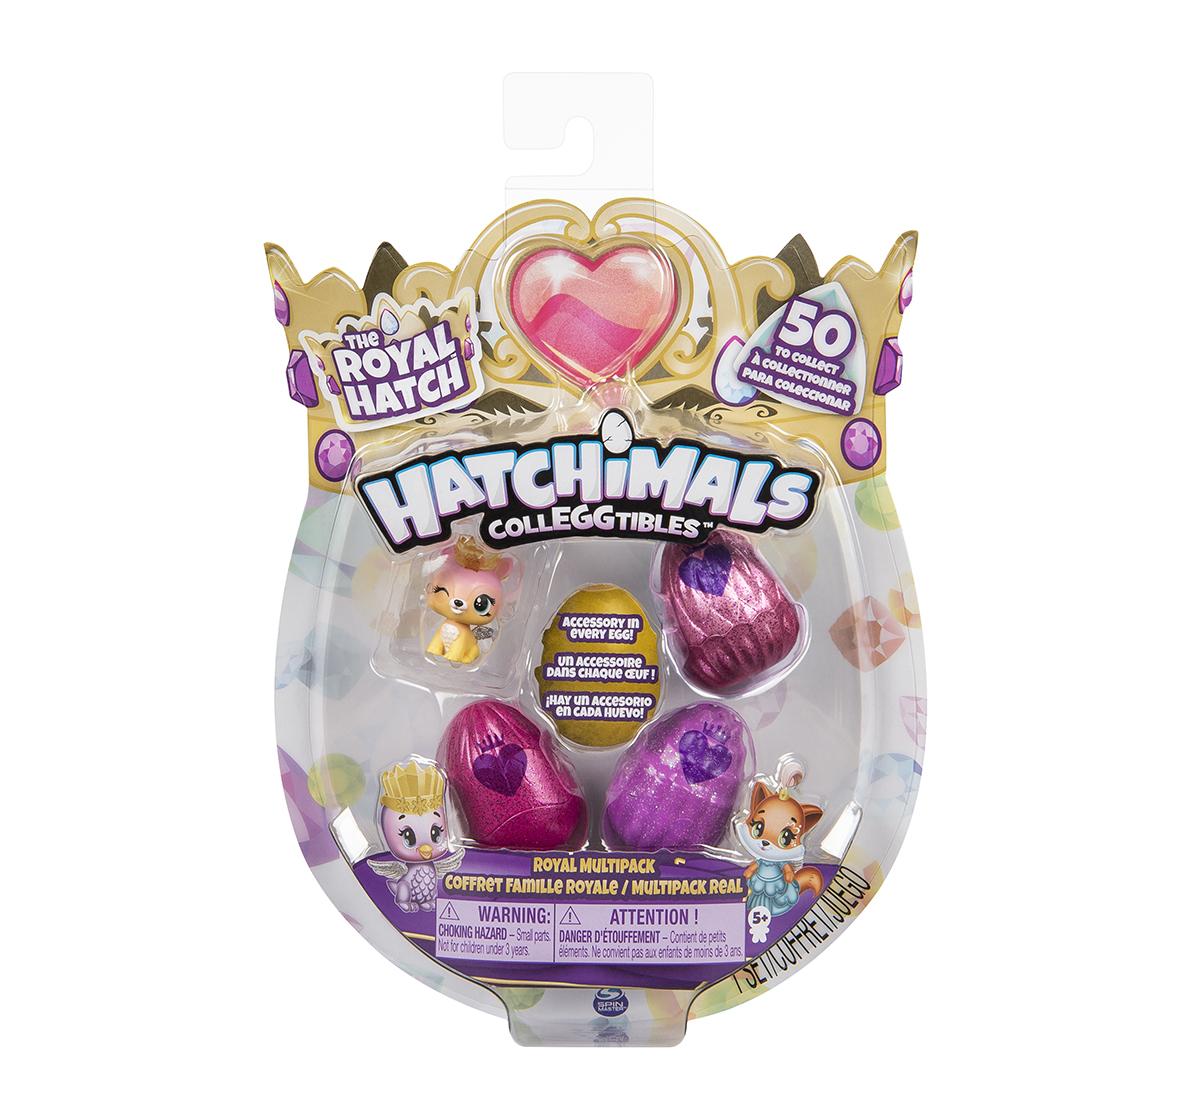 Hatchimals | Hatchimals Colleggtibles Season 6 4 Pack + Bonus Novelty for Girls age 5Y+ - 22.86 Cm